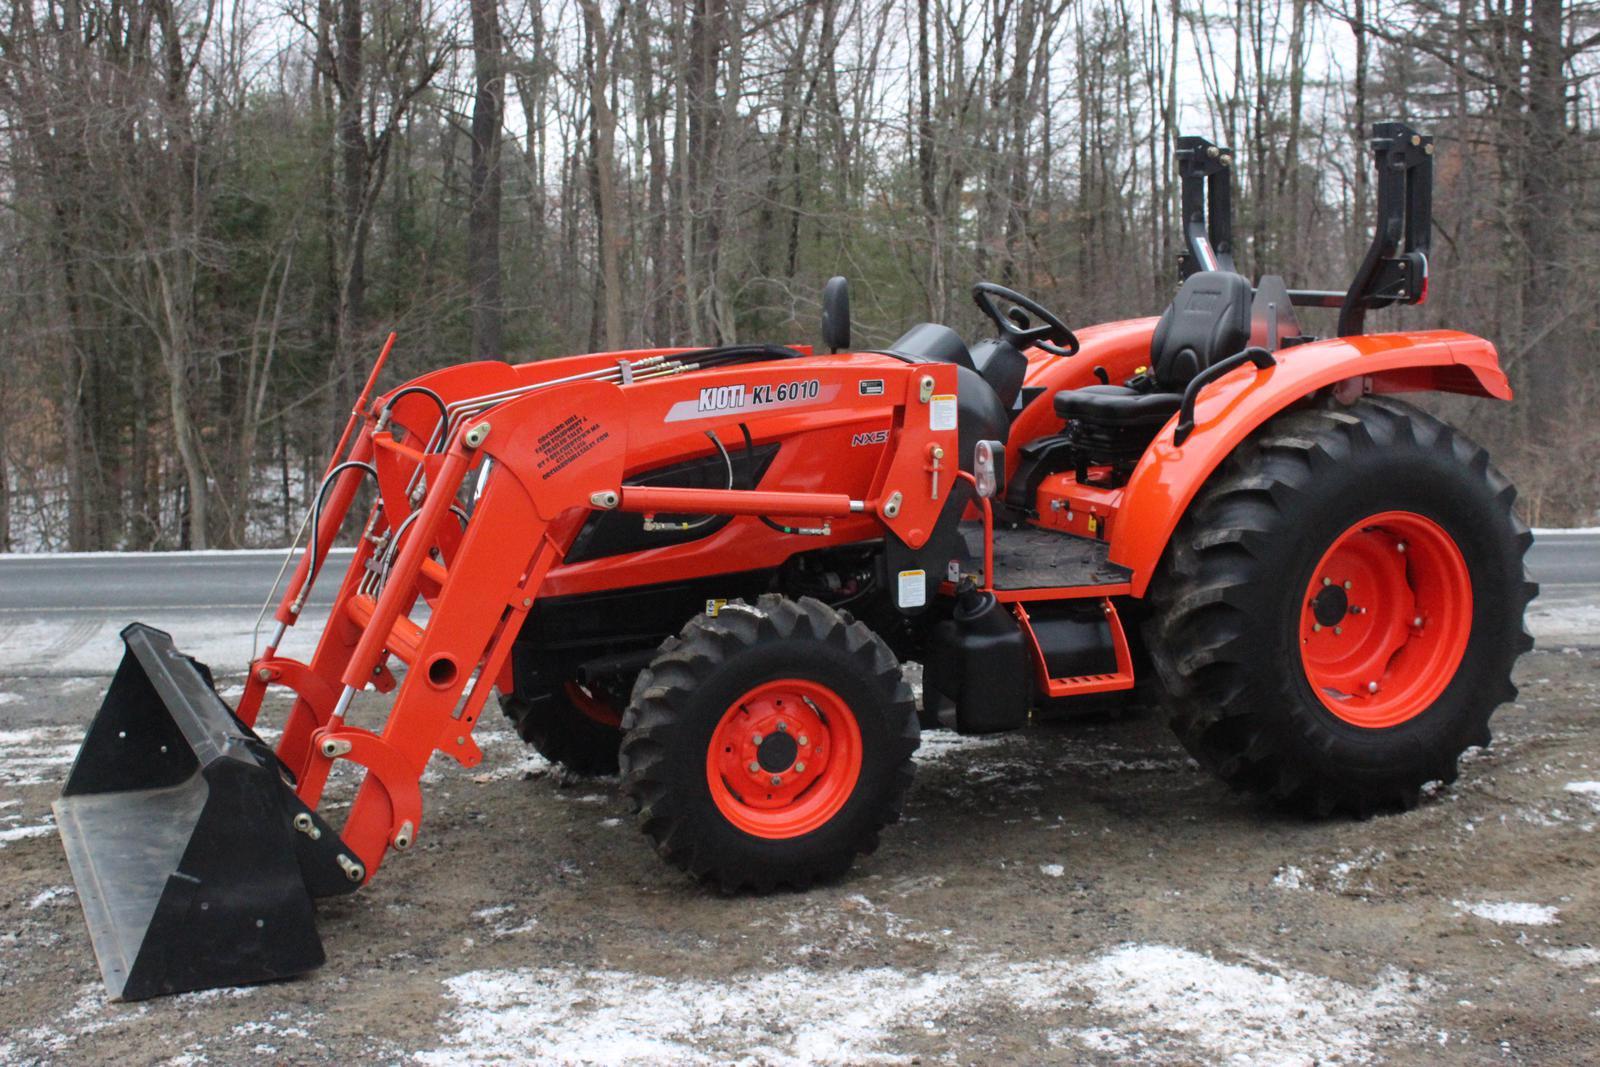 Kioti NX5510 HST 4x4 Tractor Loader for sale in Belchertown, MA